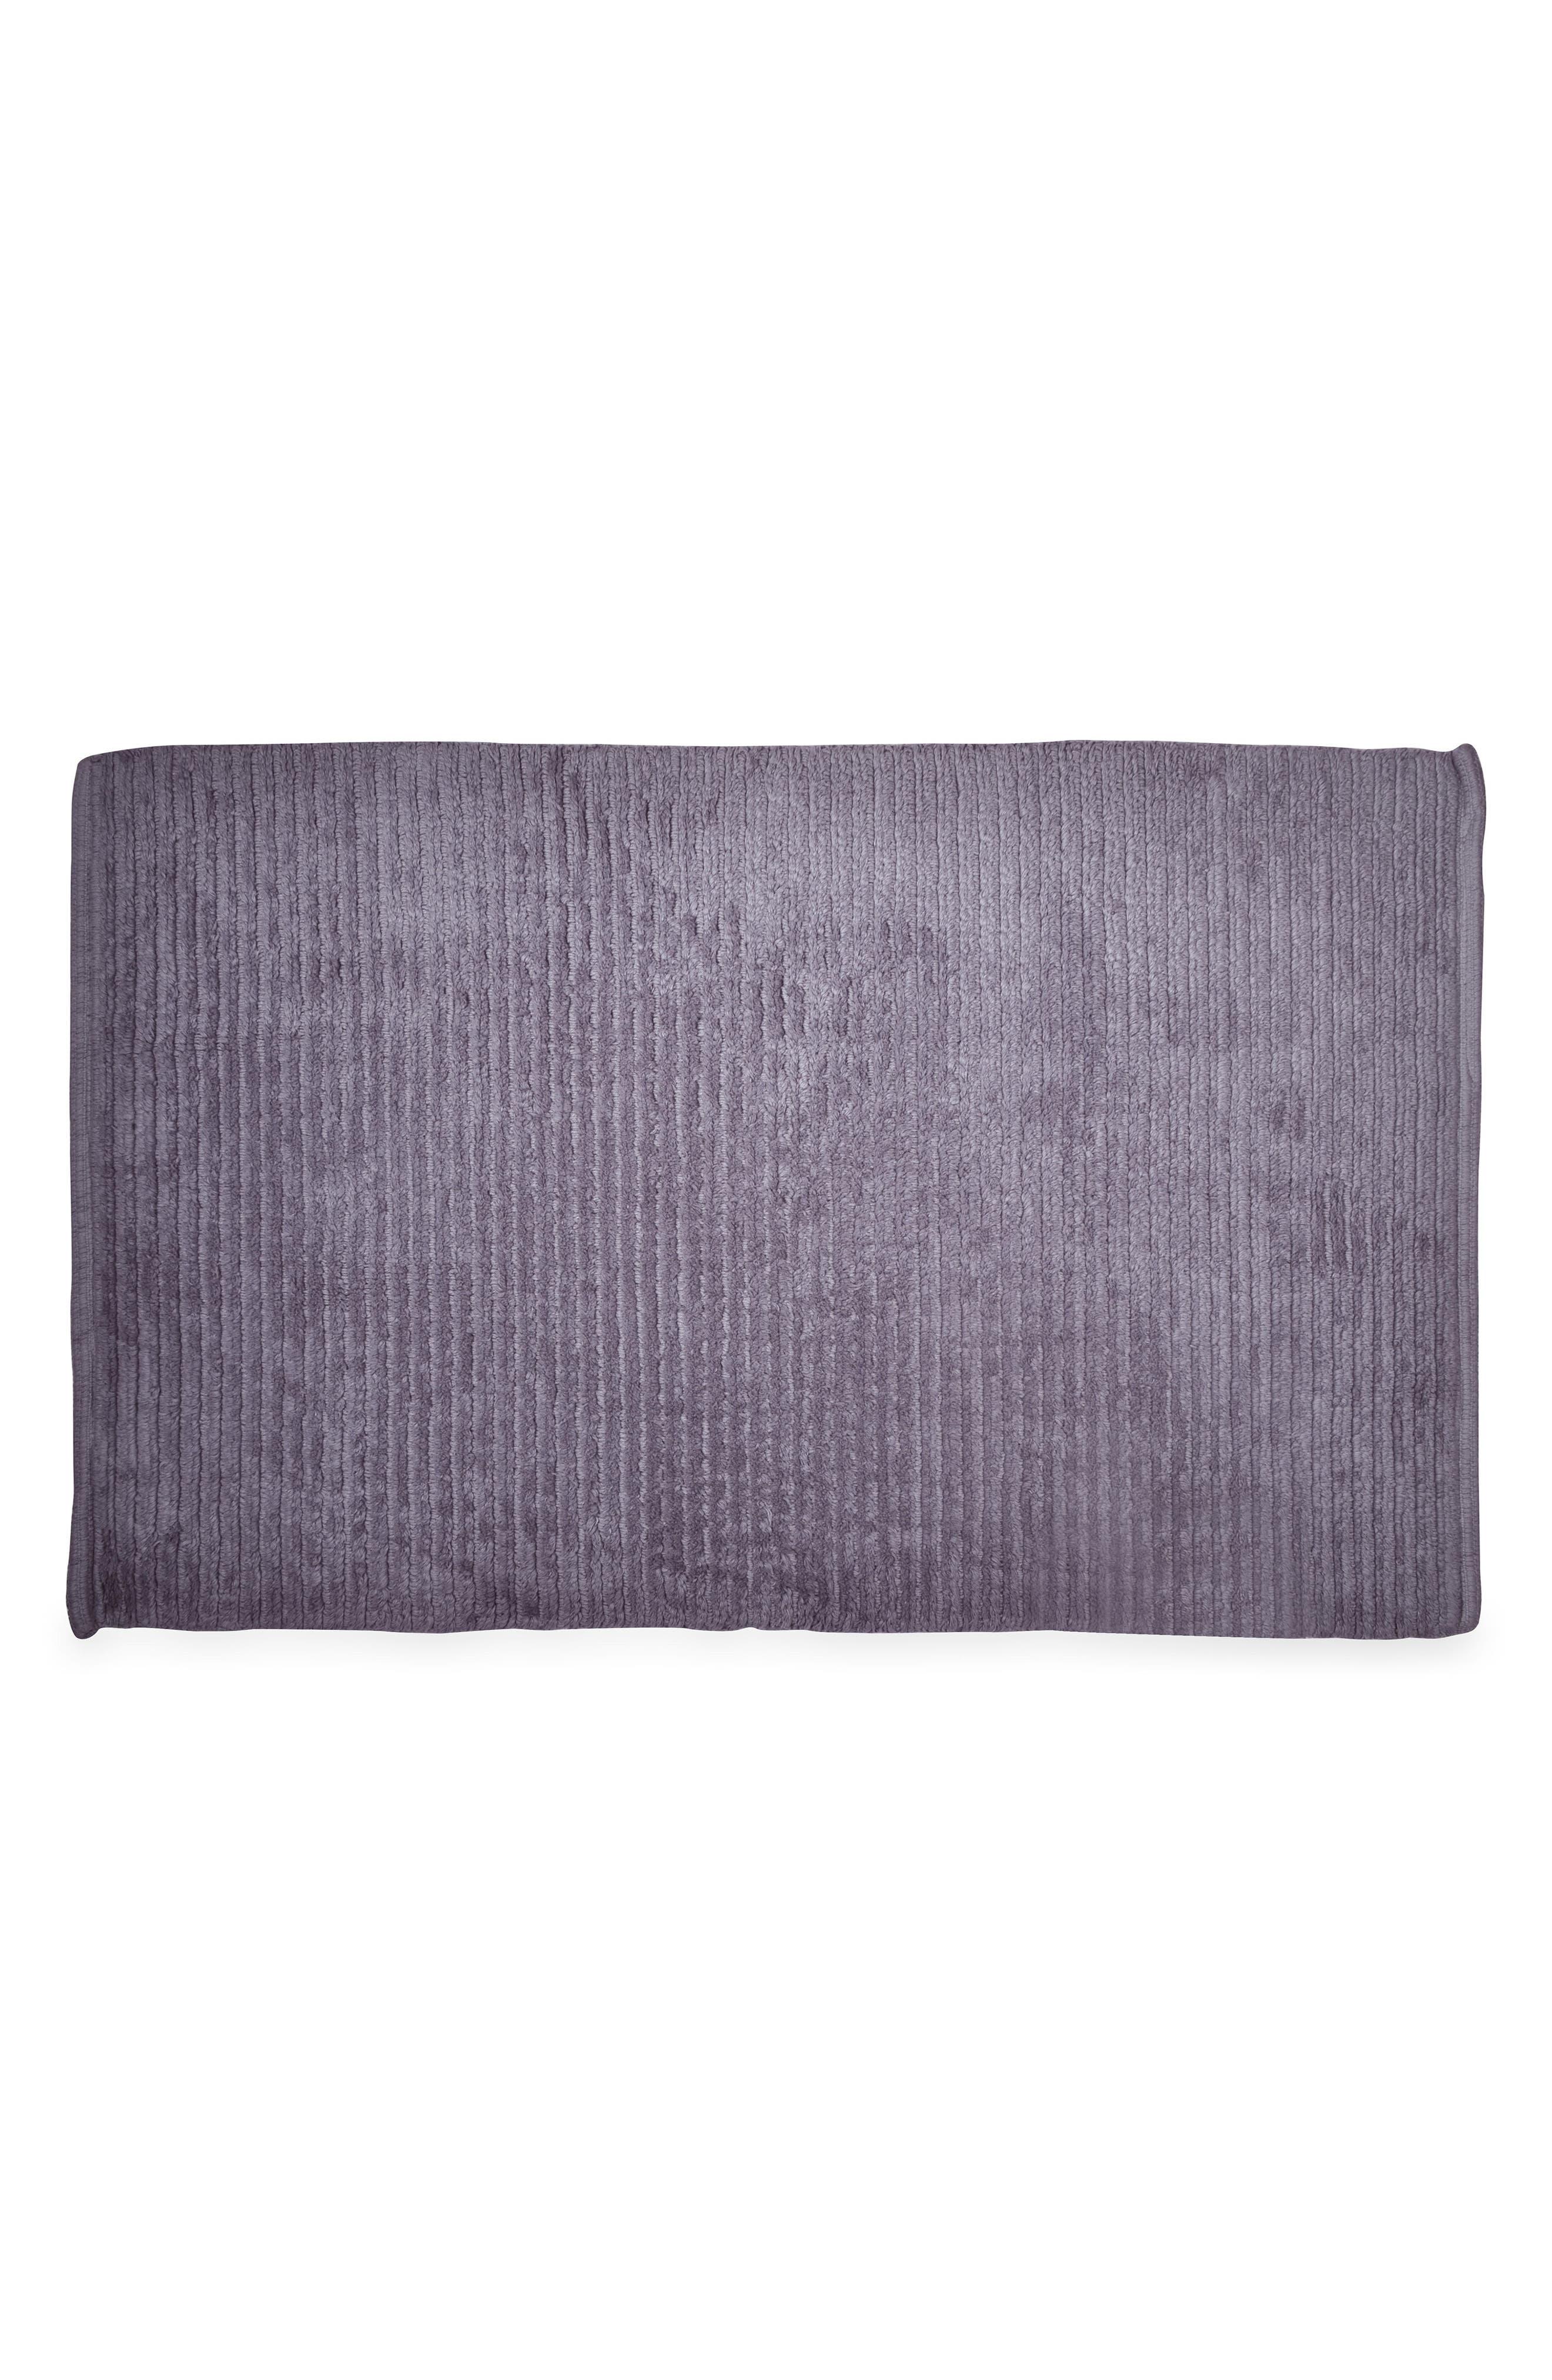 Mercer Bath Rug,                             Main thumbnail 1, color,                             Dusty Lavender